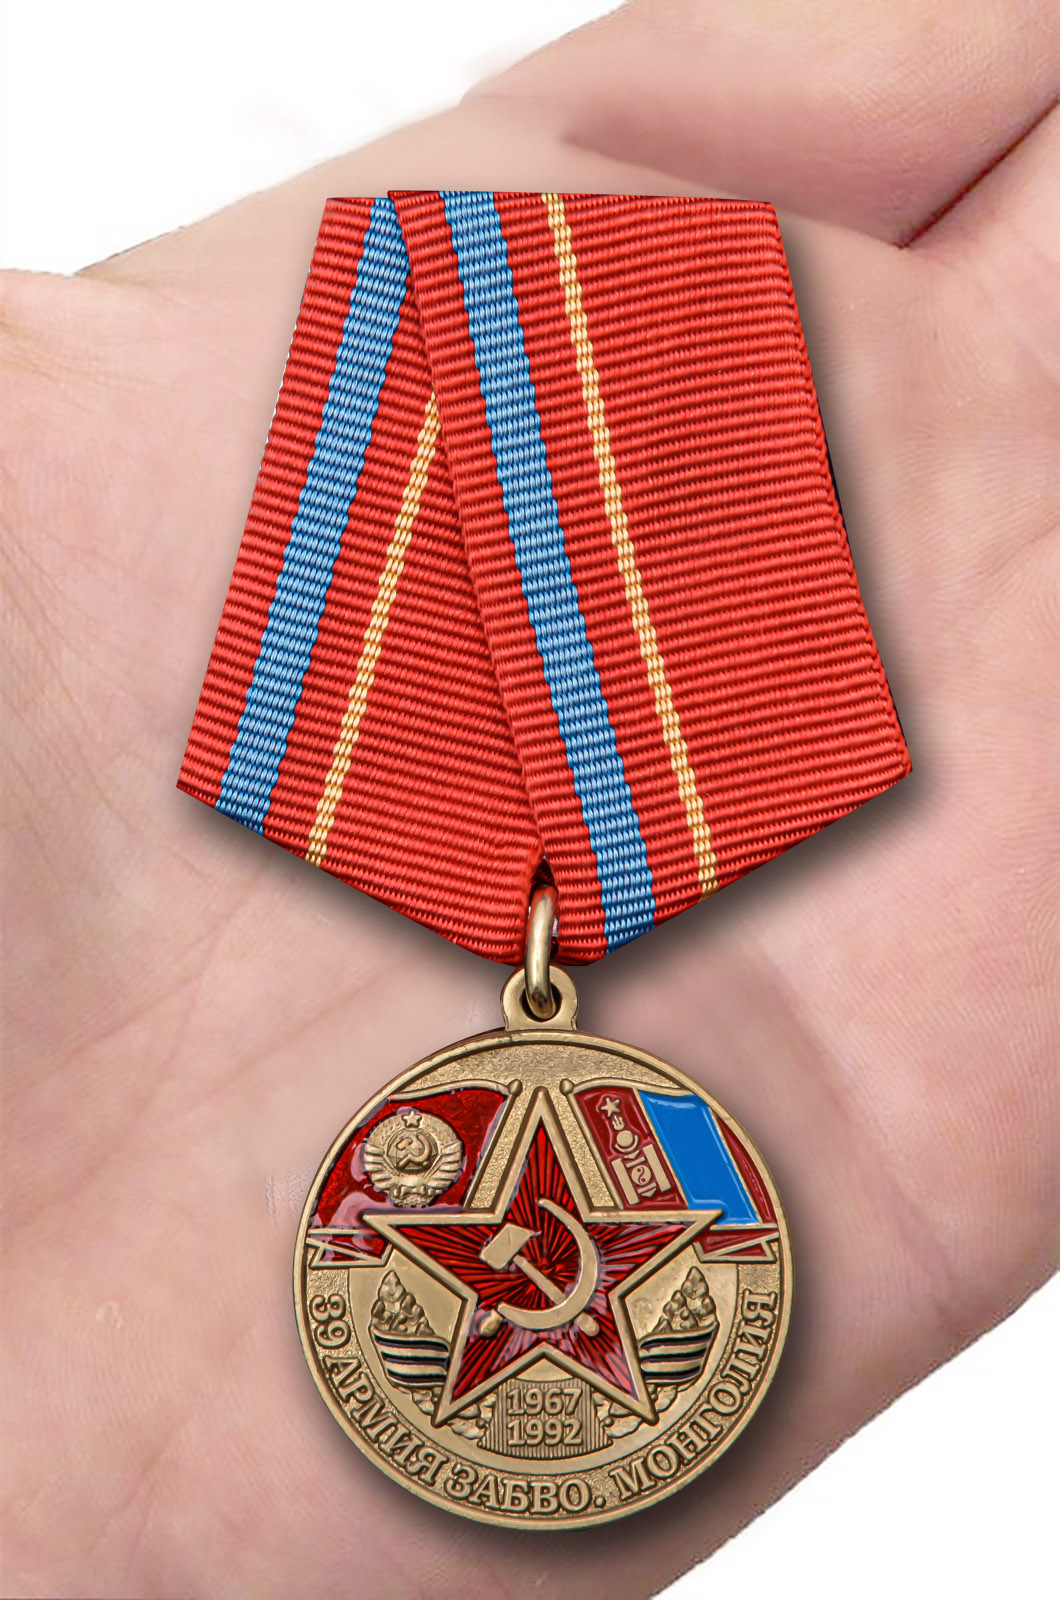 Памятная медаль 39 Армия ЗАБВО. Монголия - вид на ладони